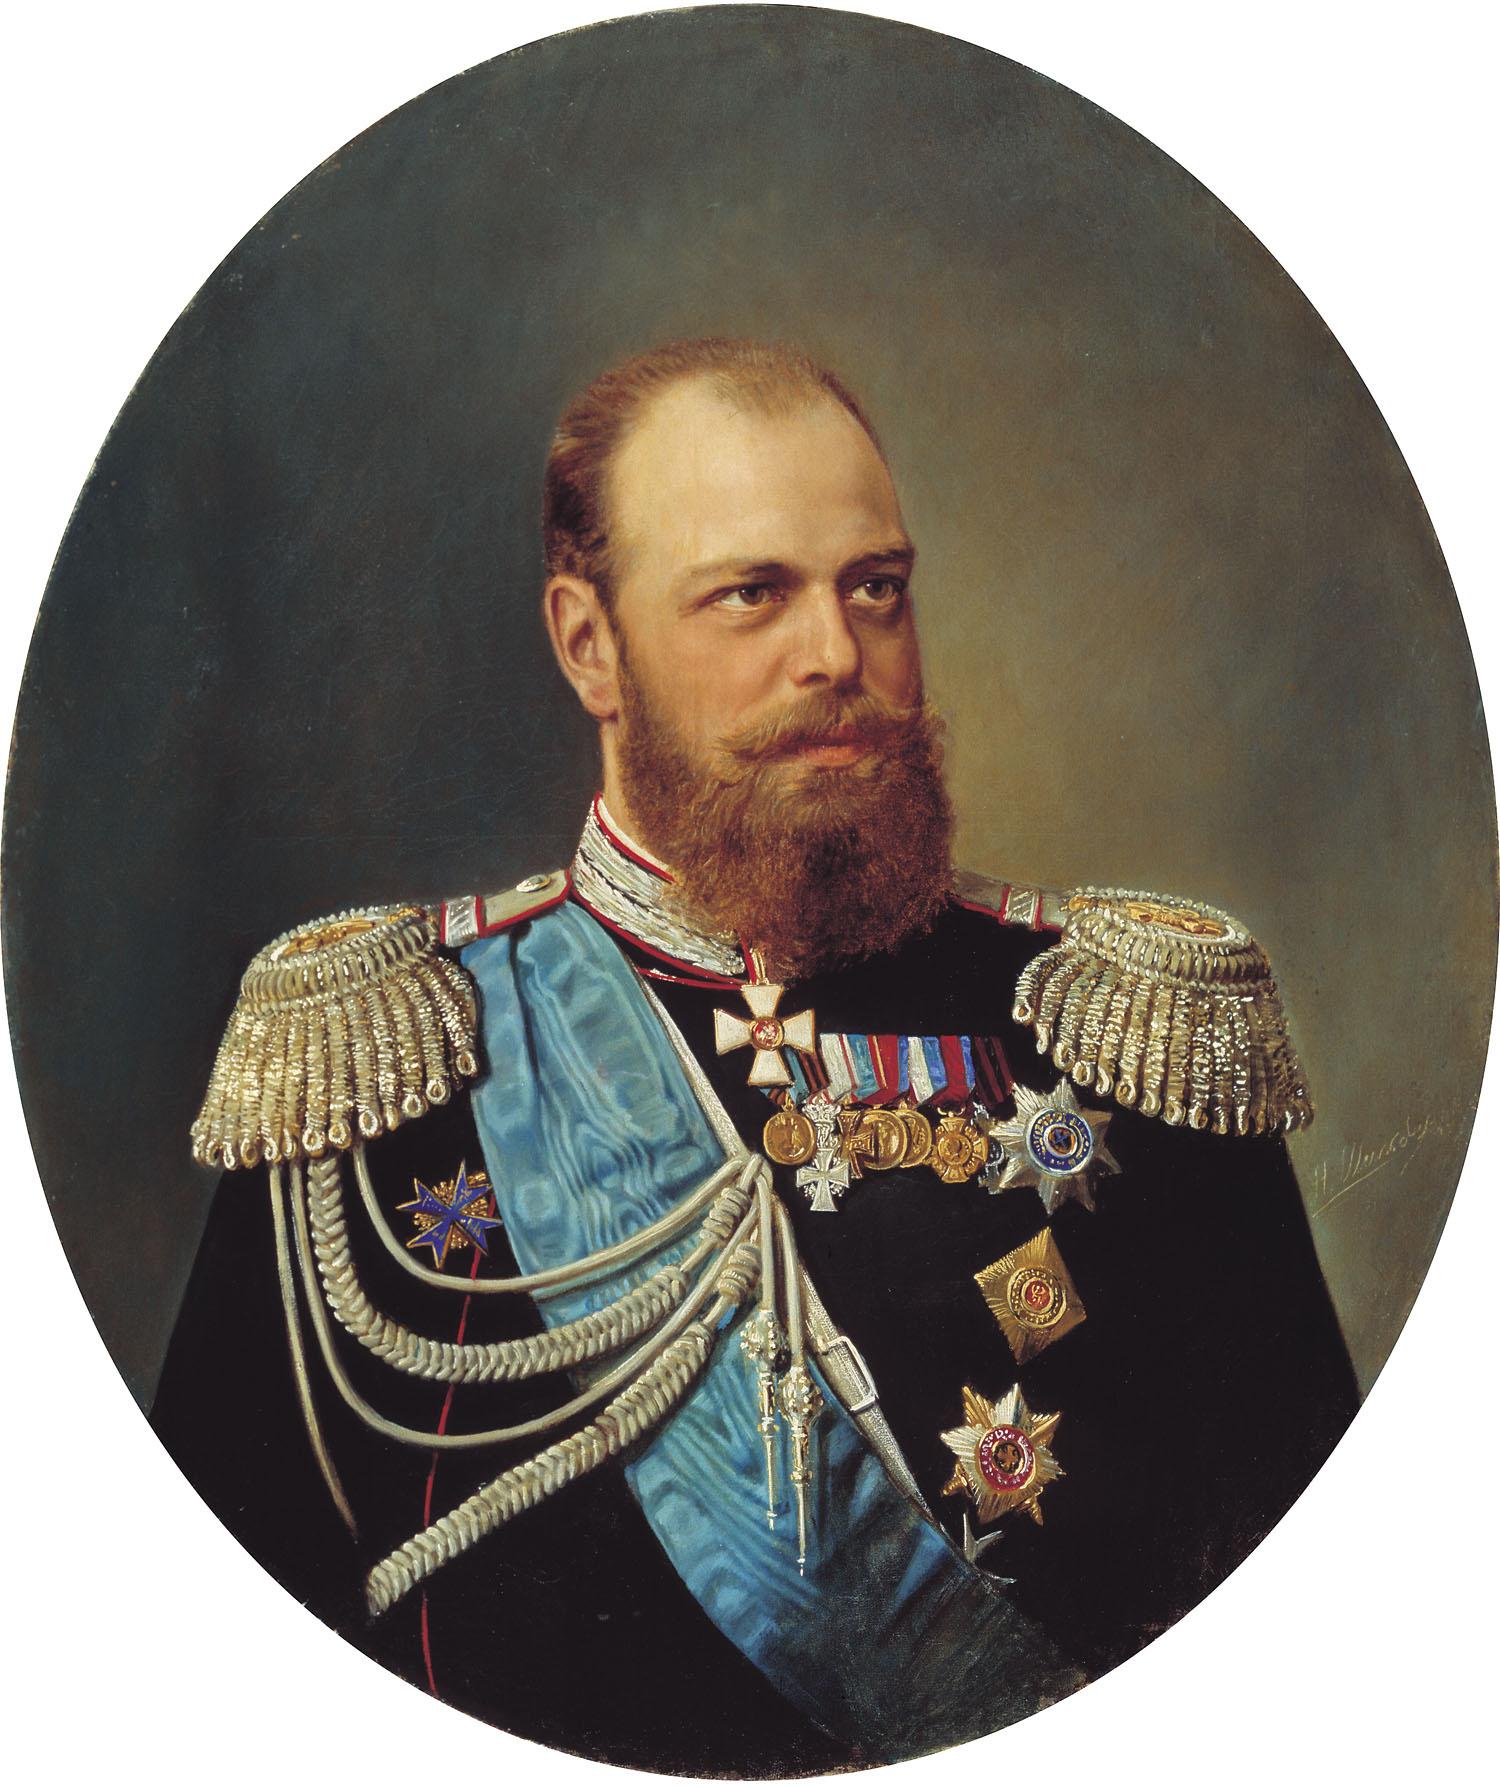 http://upload.wikimedia.org/wikipedia/commons/f/f8/Shilder_AlexanderIII.jpg?uselang=ru